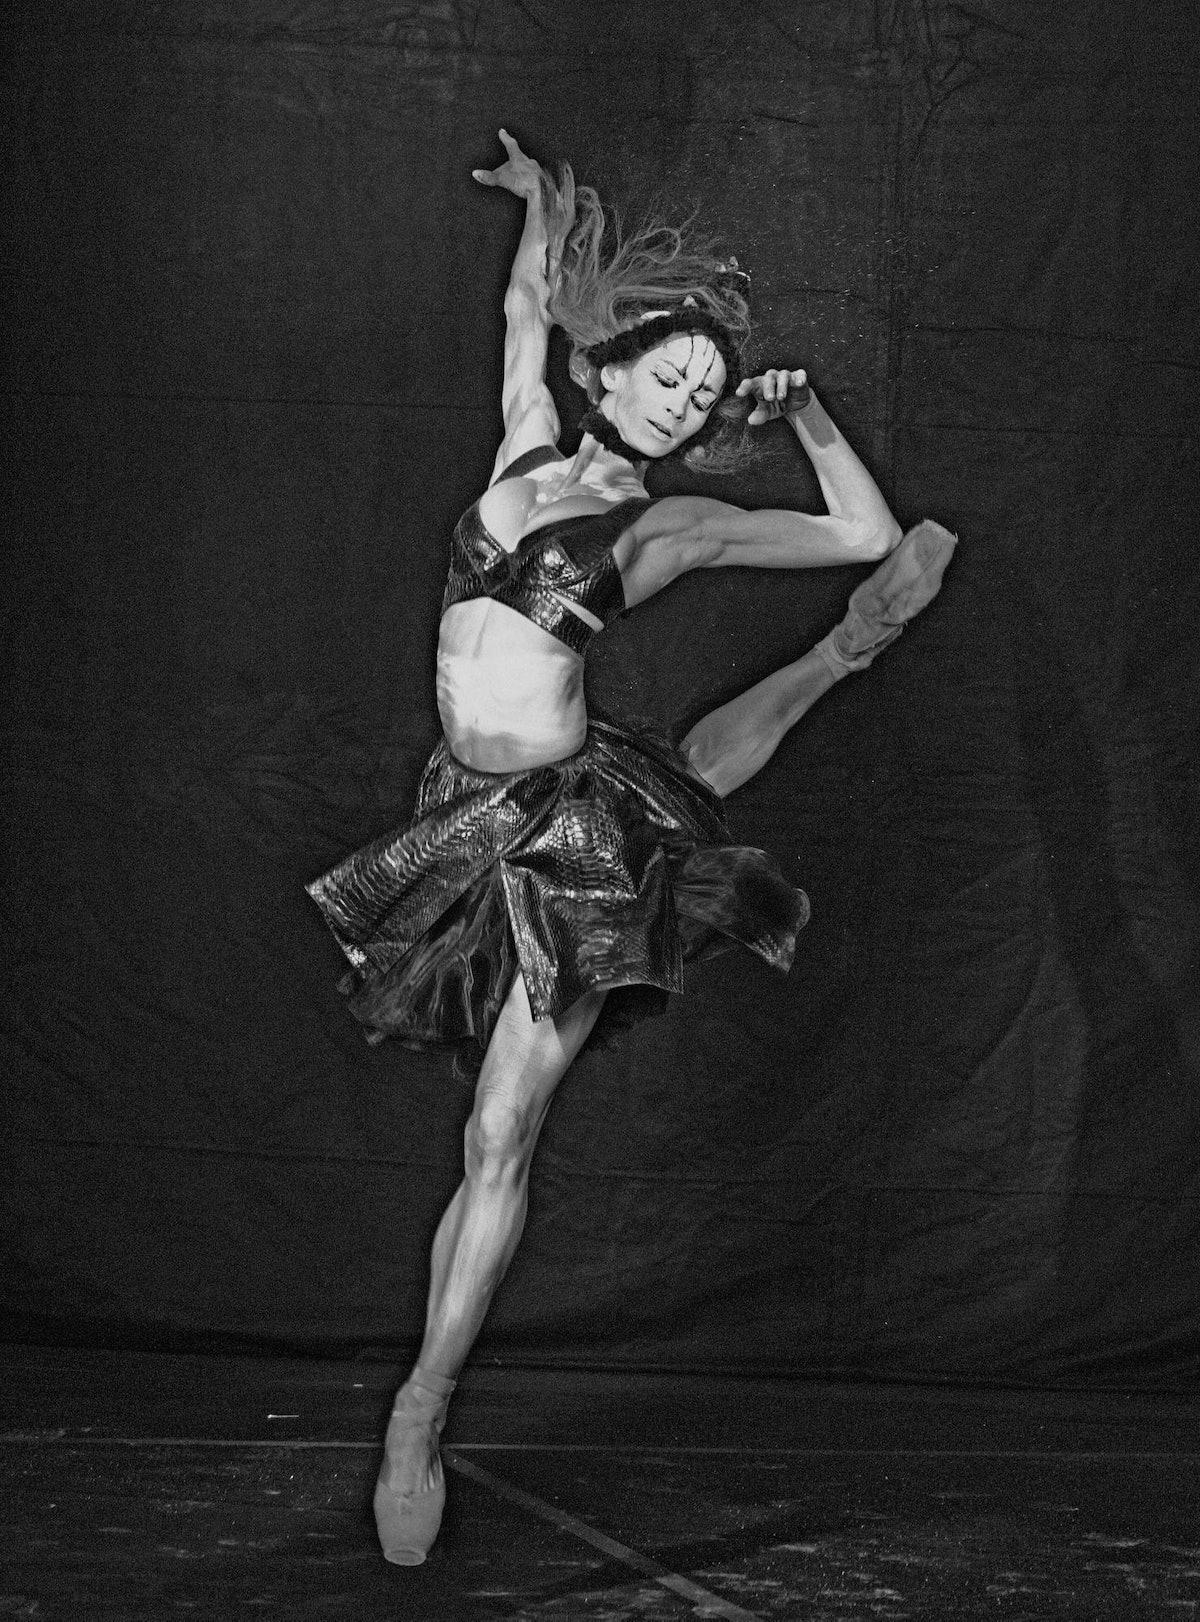 Polina Semionova leaping